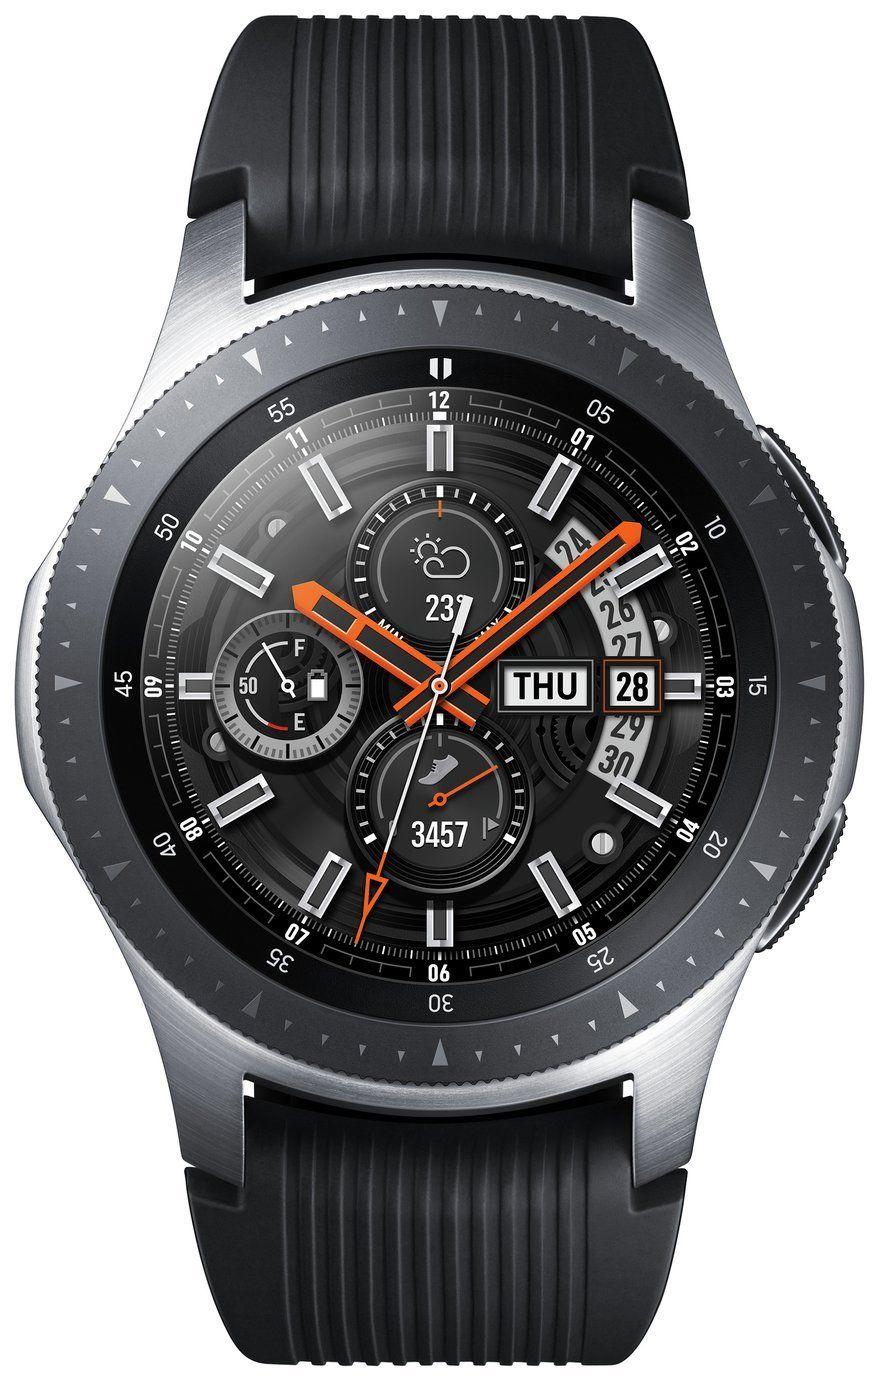 Refurbished Samsung galaxy watch 46mm £123.99 42mm £116.99 @ Argos Ebay